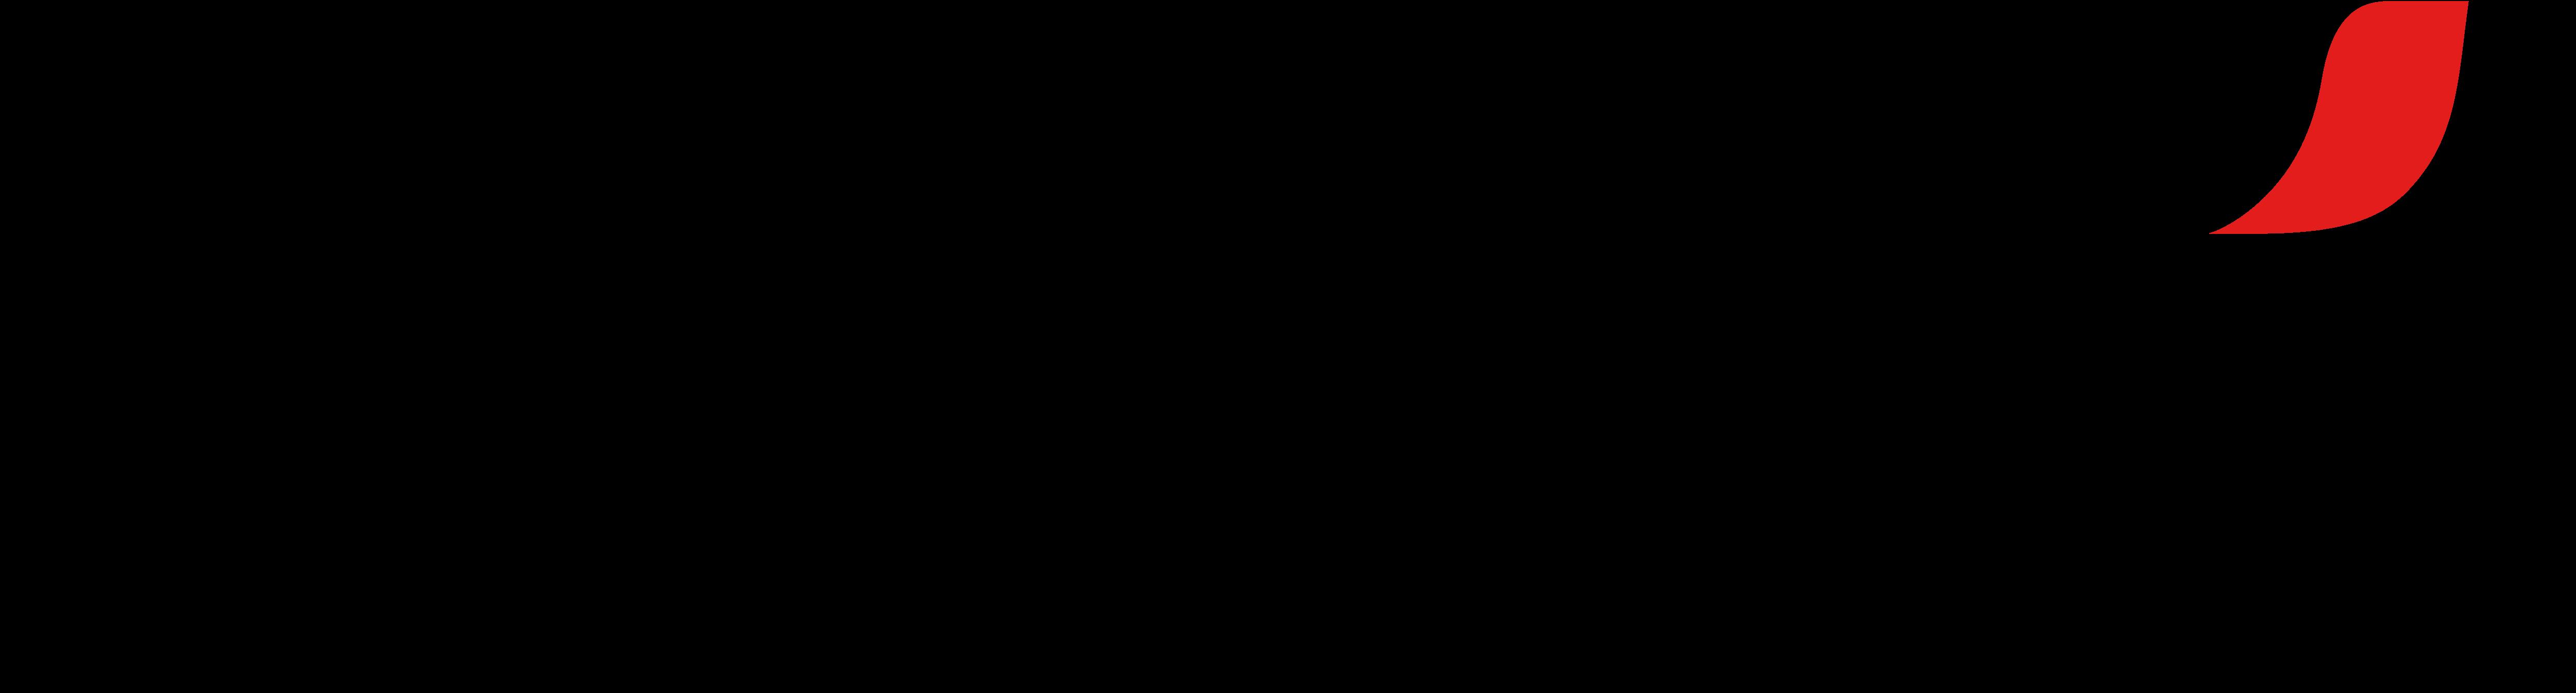 Image result for nescafe logo